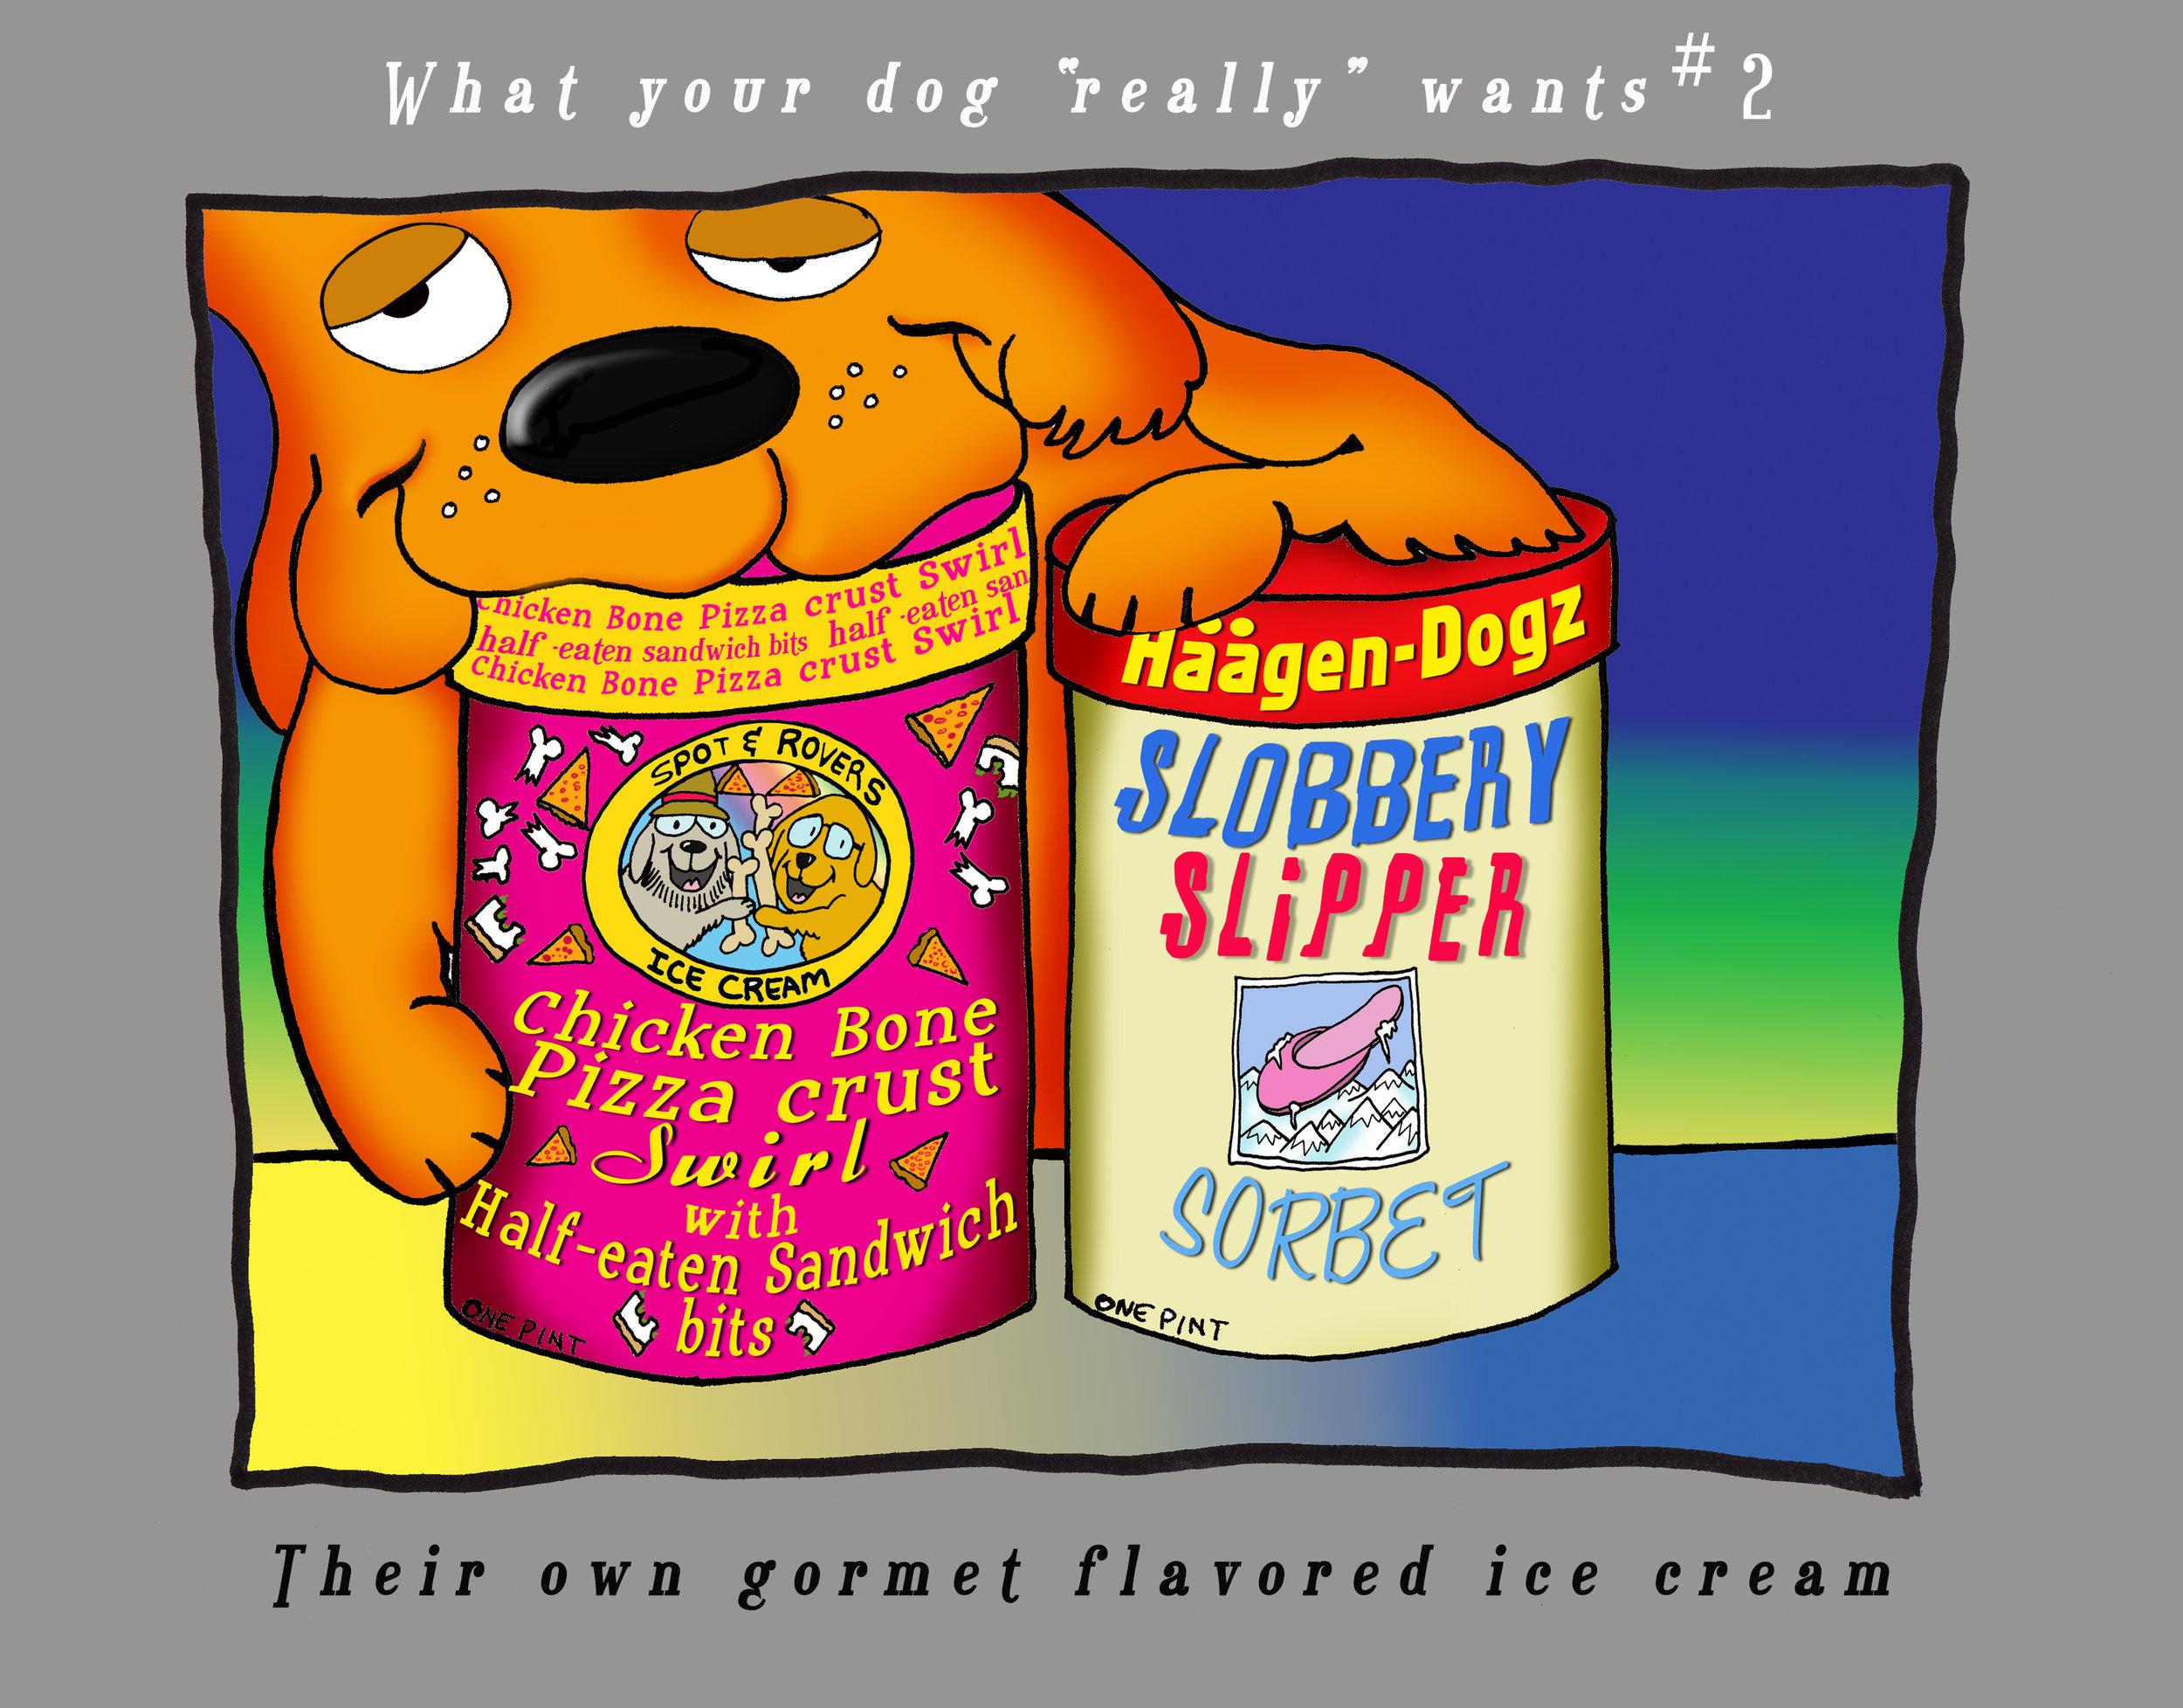 2-Gormet IcecreamVS#5-final.jpg